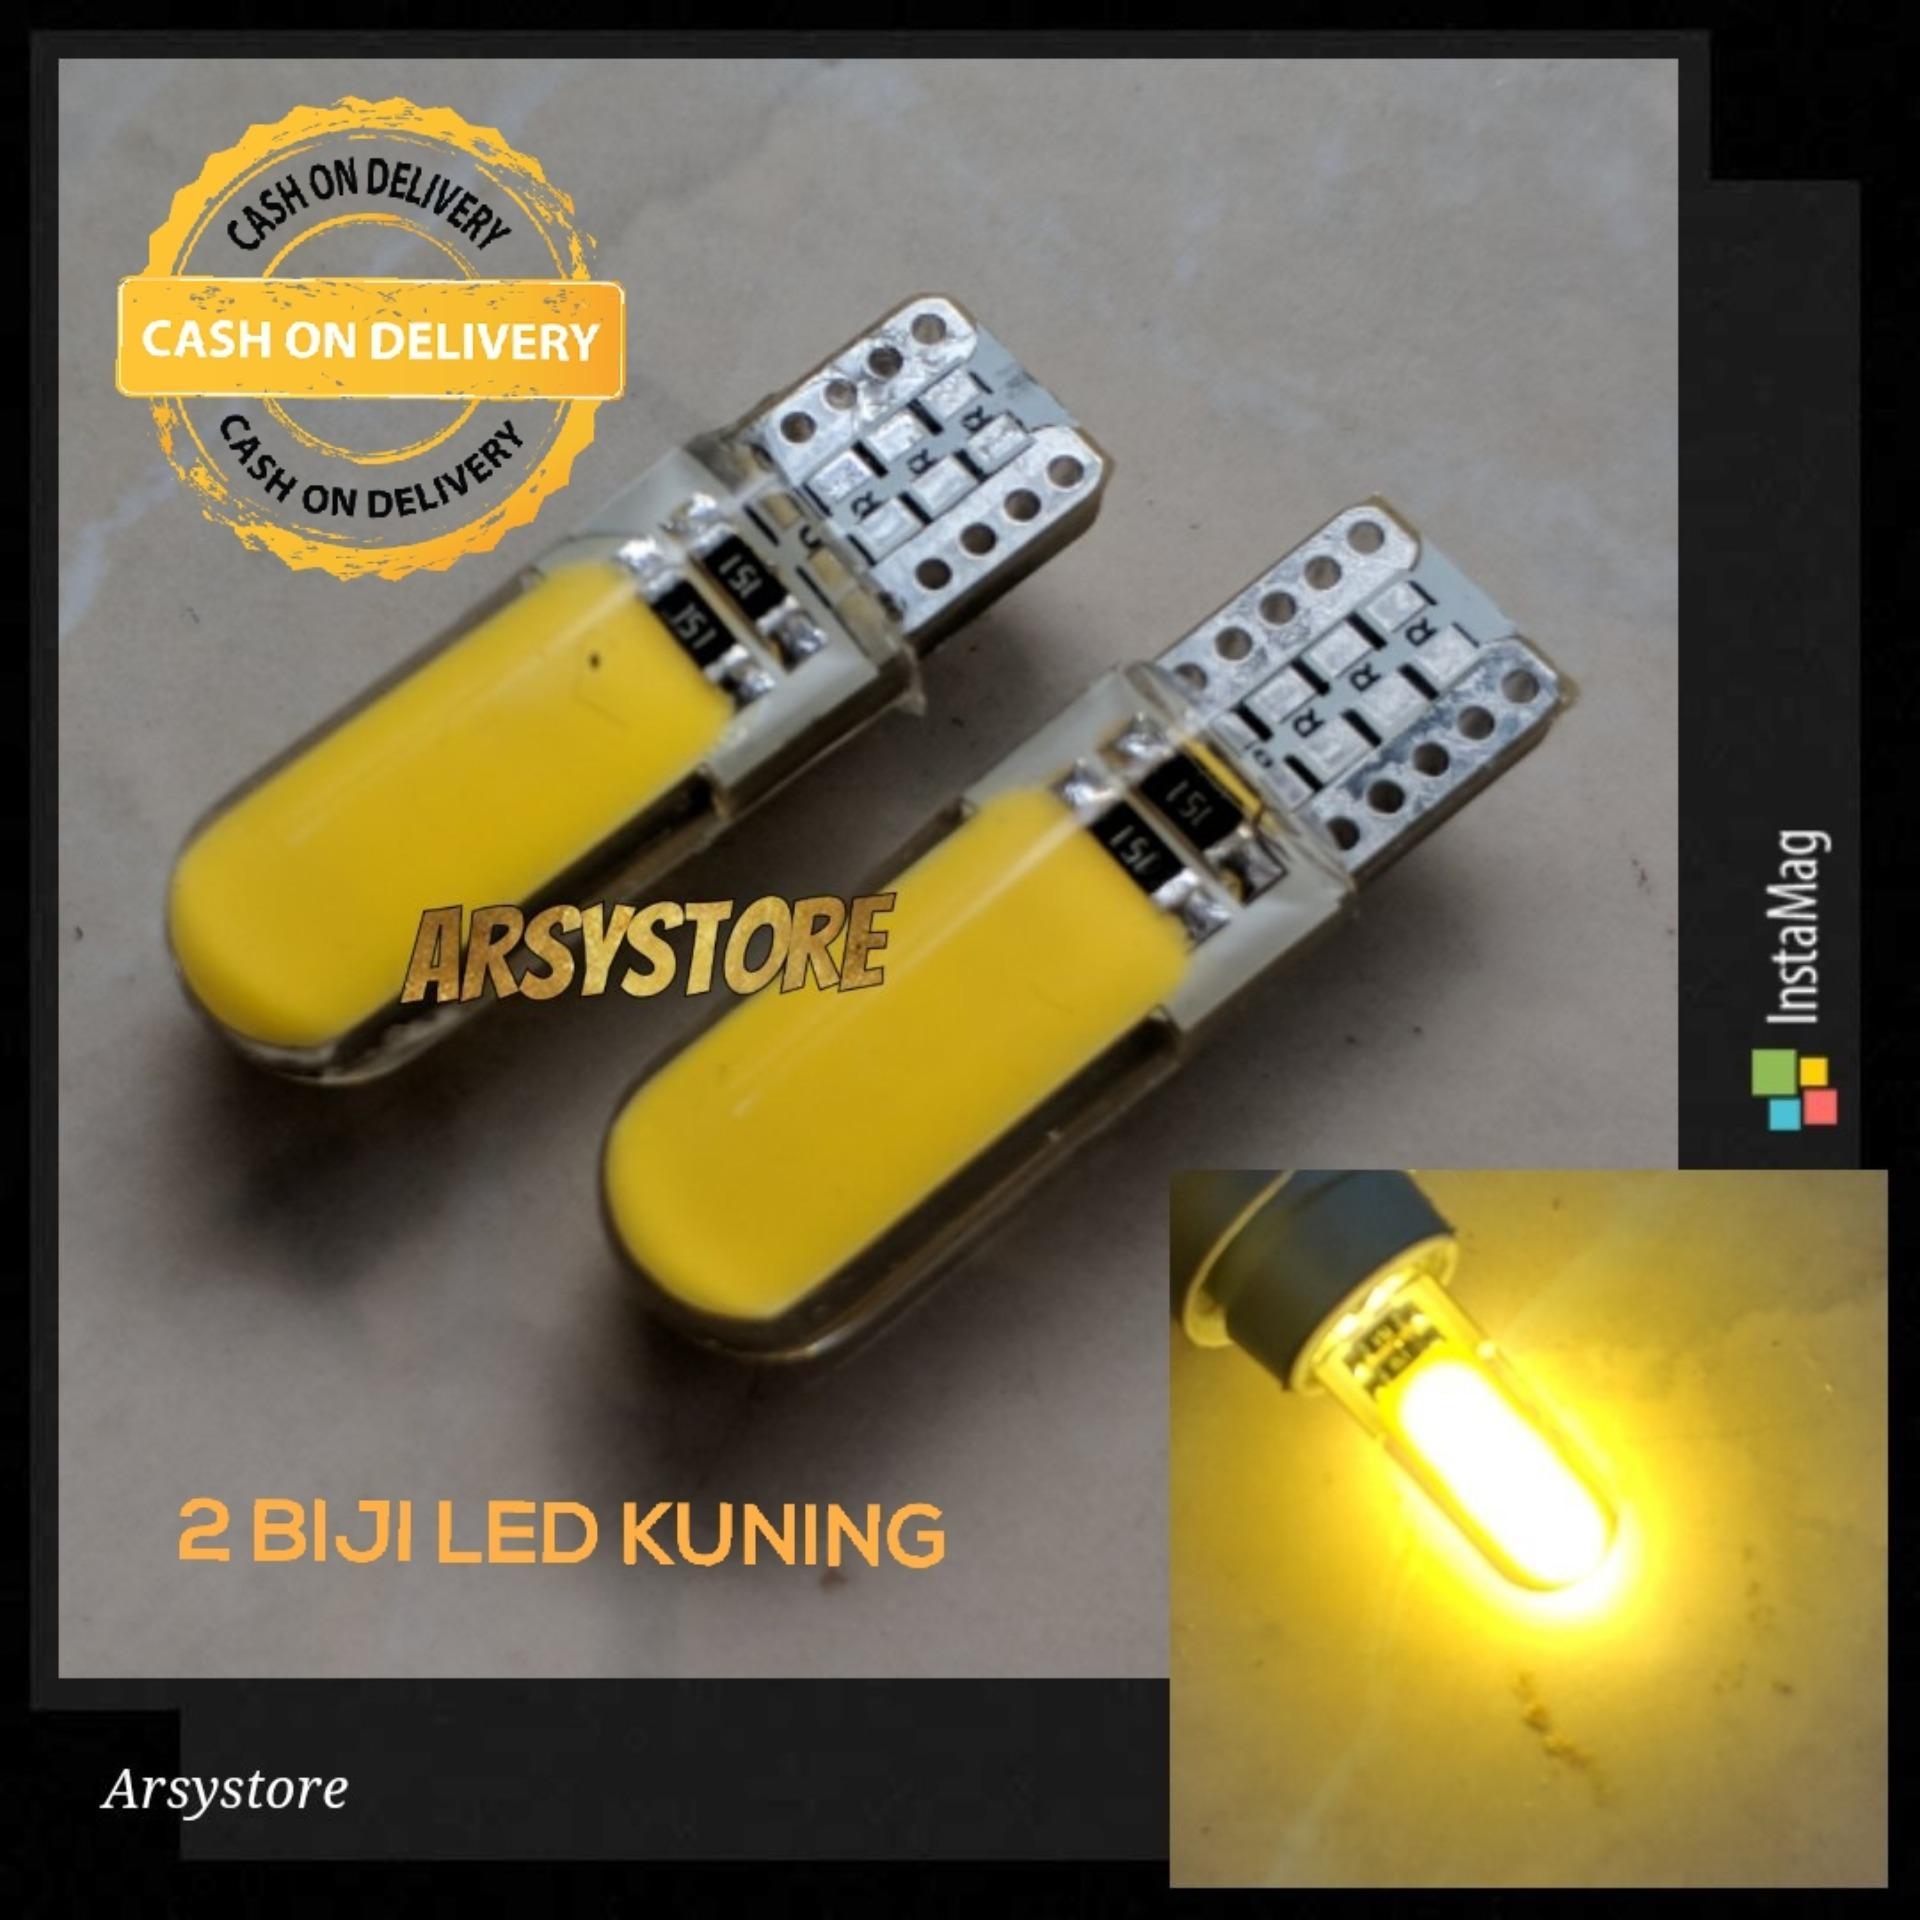 Jual Produk Led Terlengkap Bohlam Lampu Senja T10 11watt Super Terang Nyala Strobo 2 Biji Cob Plasma Silicon Jelly Metal Soket Sein Plat Nomor Mundur